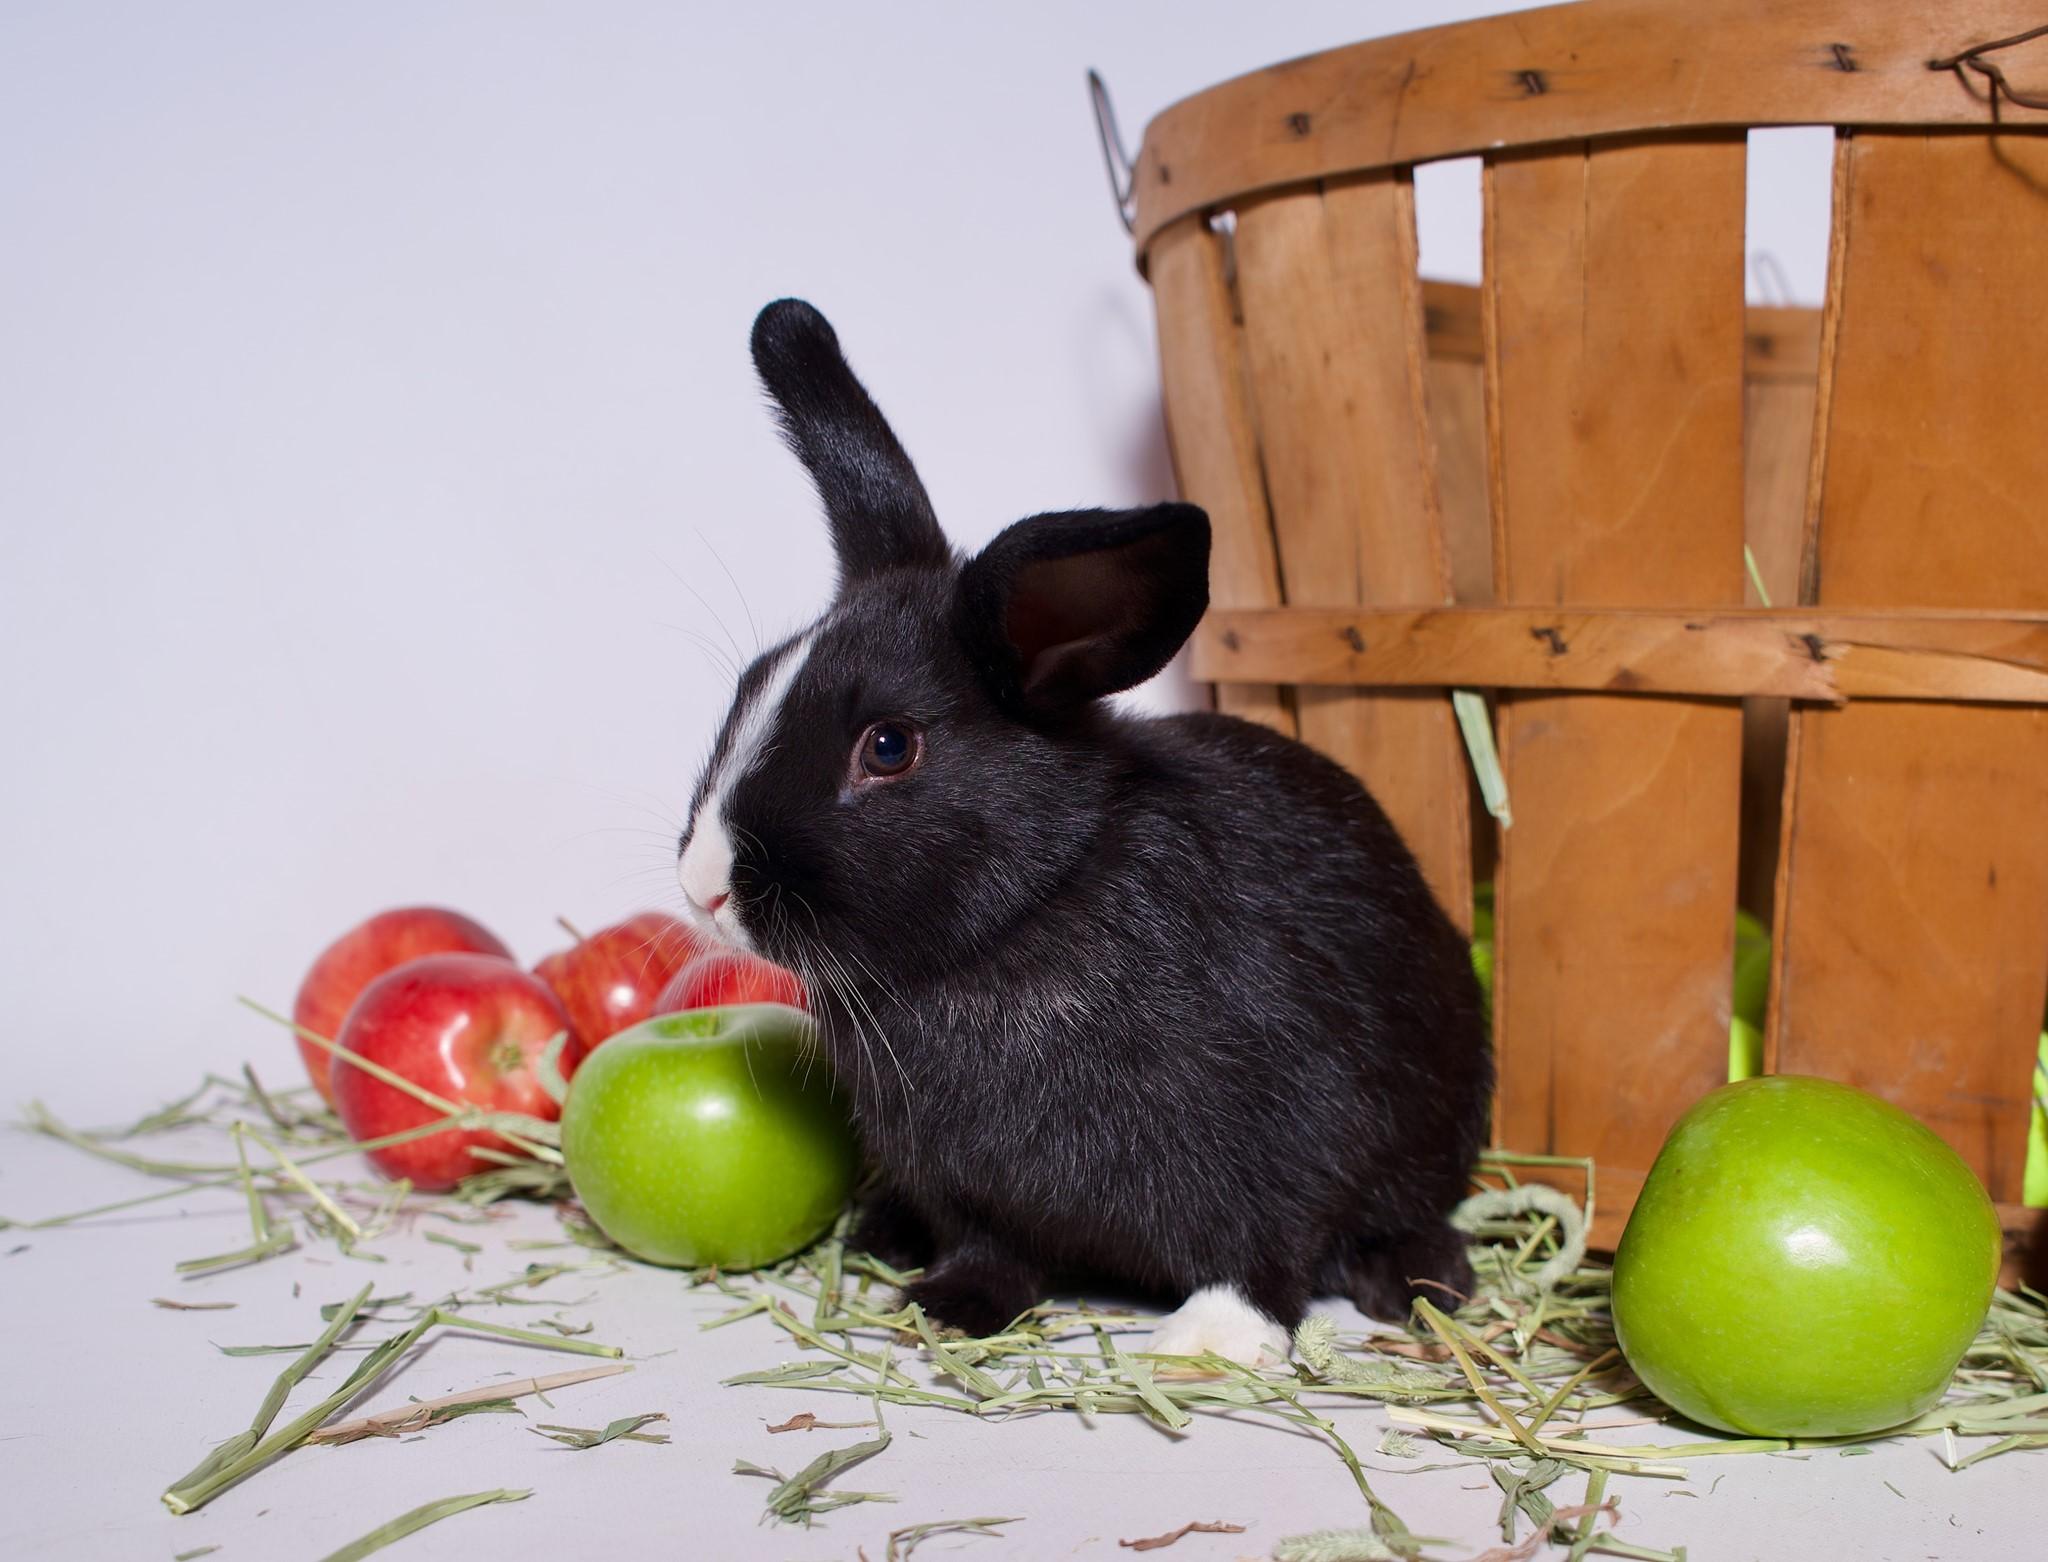 Adopt bunny in Riverside, CA